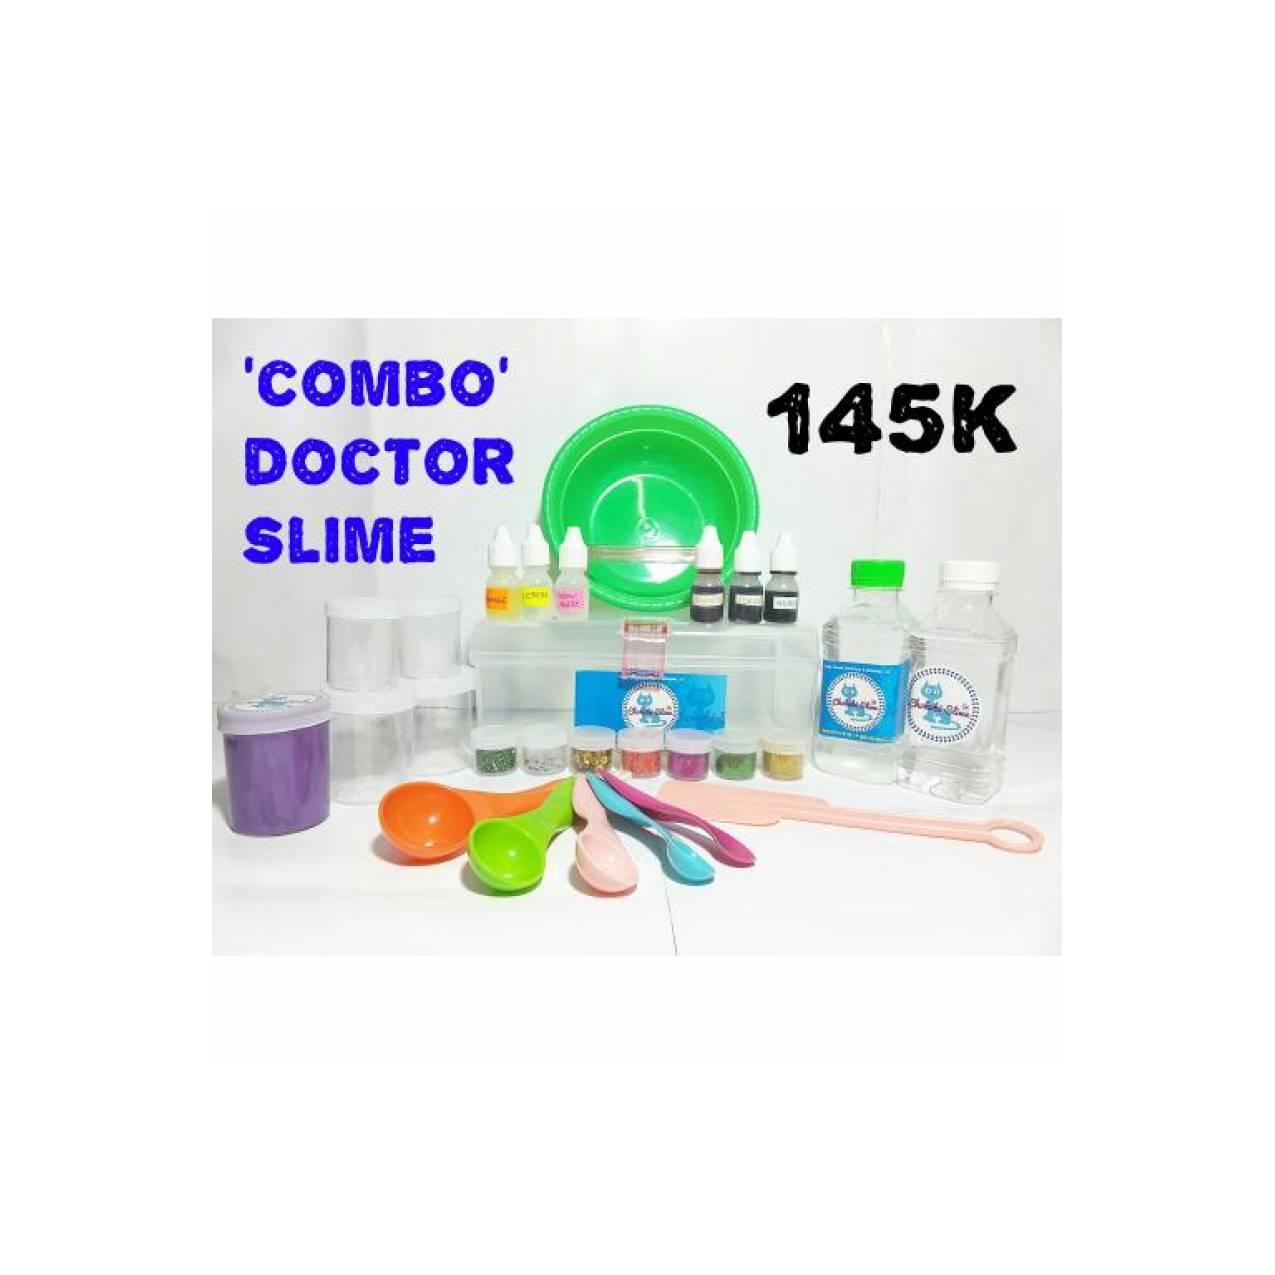 Gom Obat Sariawan Slime Act Activator Murah Untuk Bikin Tetesbotol Bubuk Slim Pijar 500 Gram  Berkualitas 8ml Borax Gliserin Aktivator Source Promo